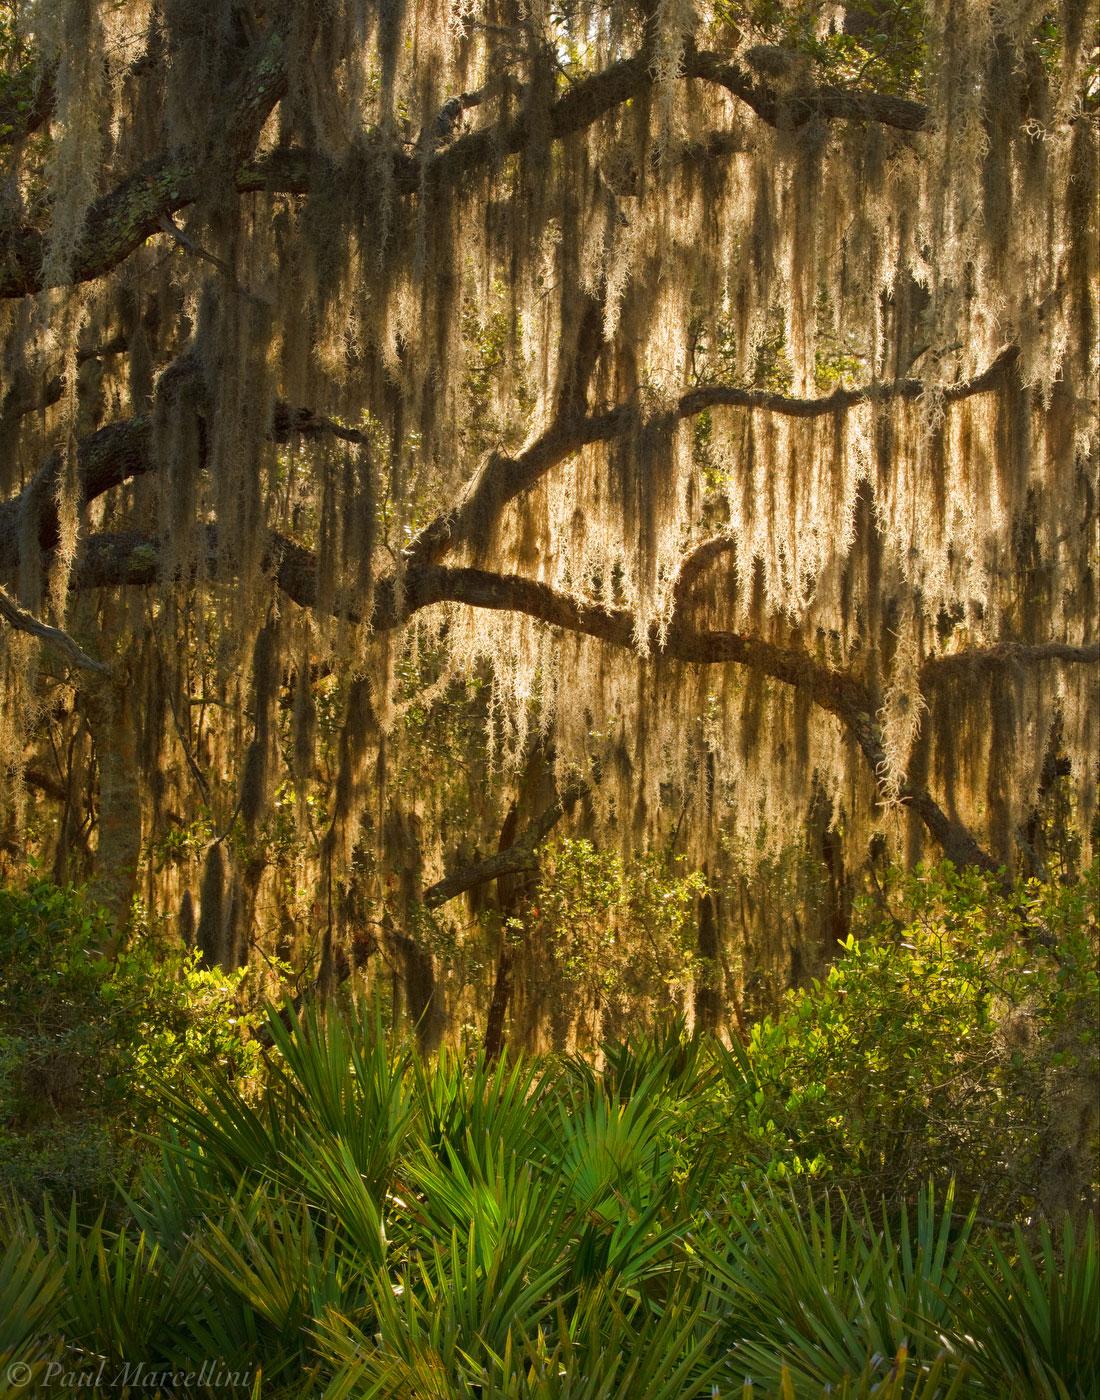 big talbot island, florida, spanish moss, tillandsia usneoides, north florida, nature, photography, photo